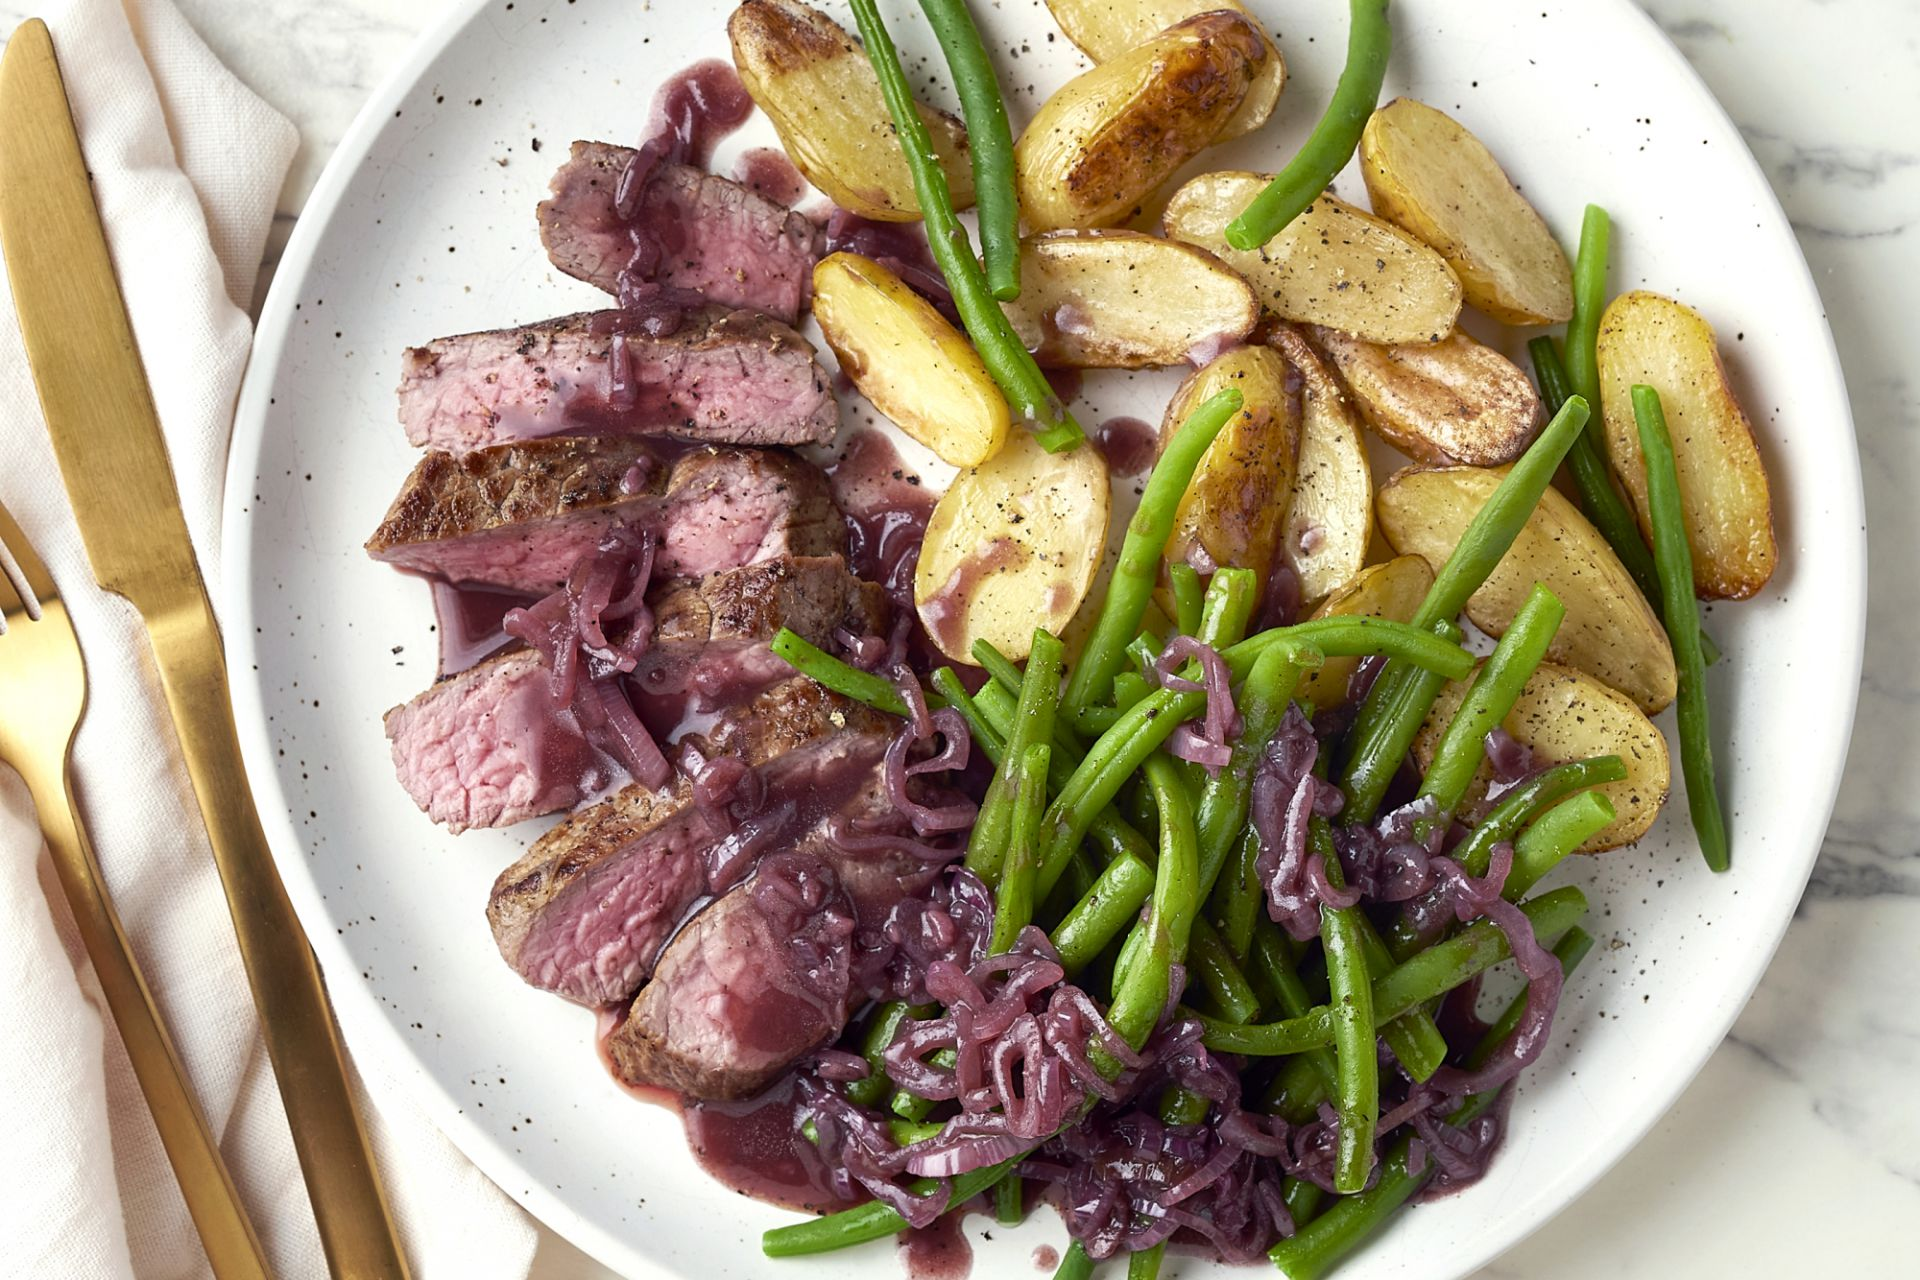 Steak met boontjes, sjalotten-balsamicosaus en geroosterde krieltjes